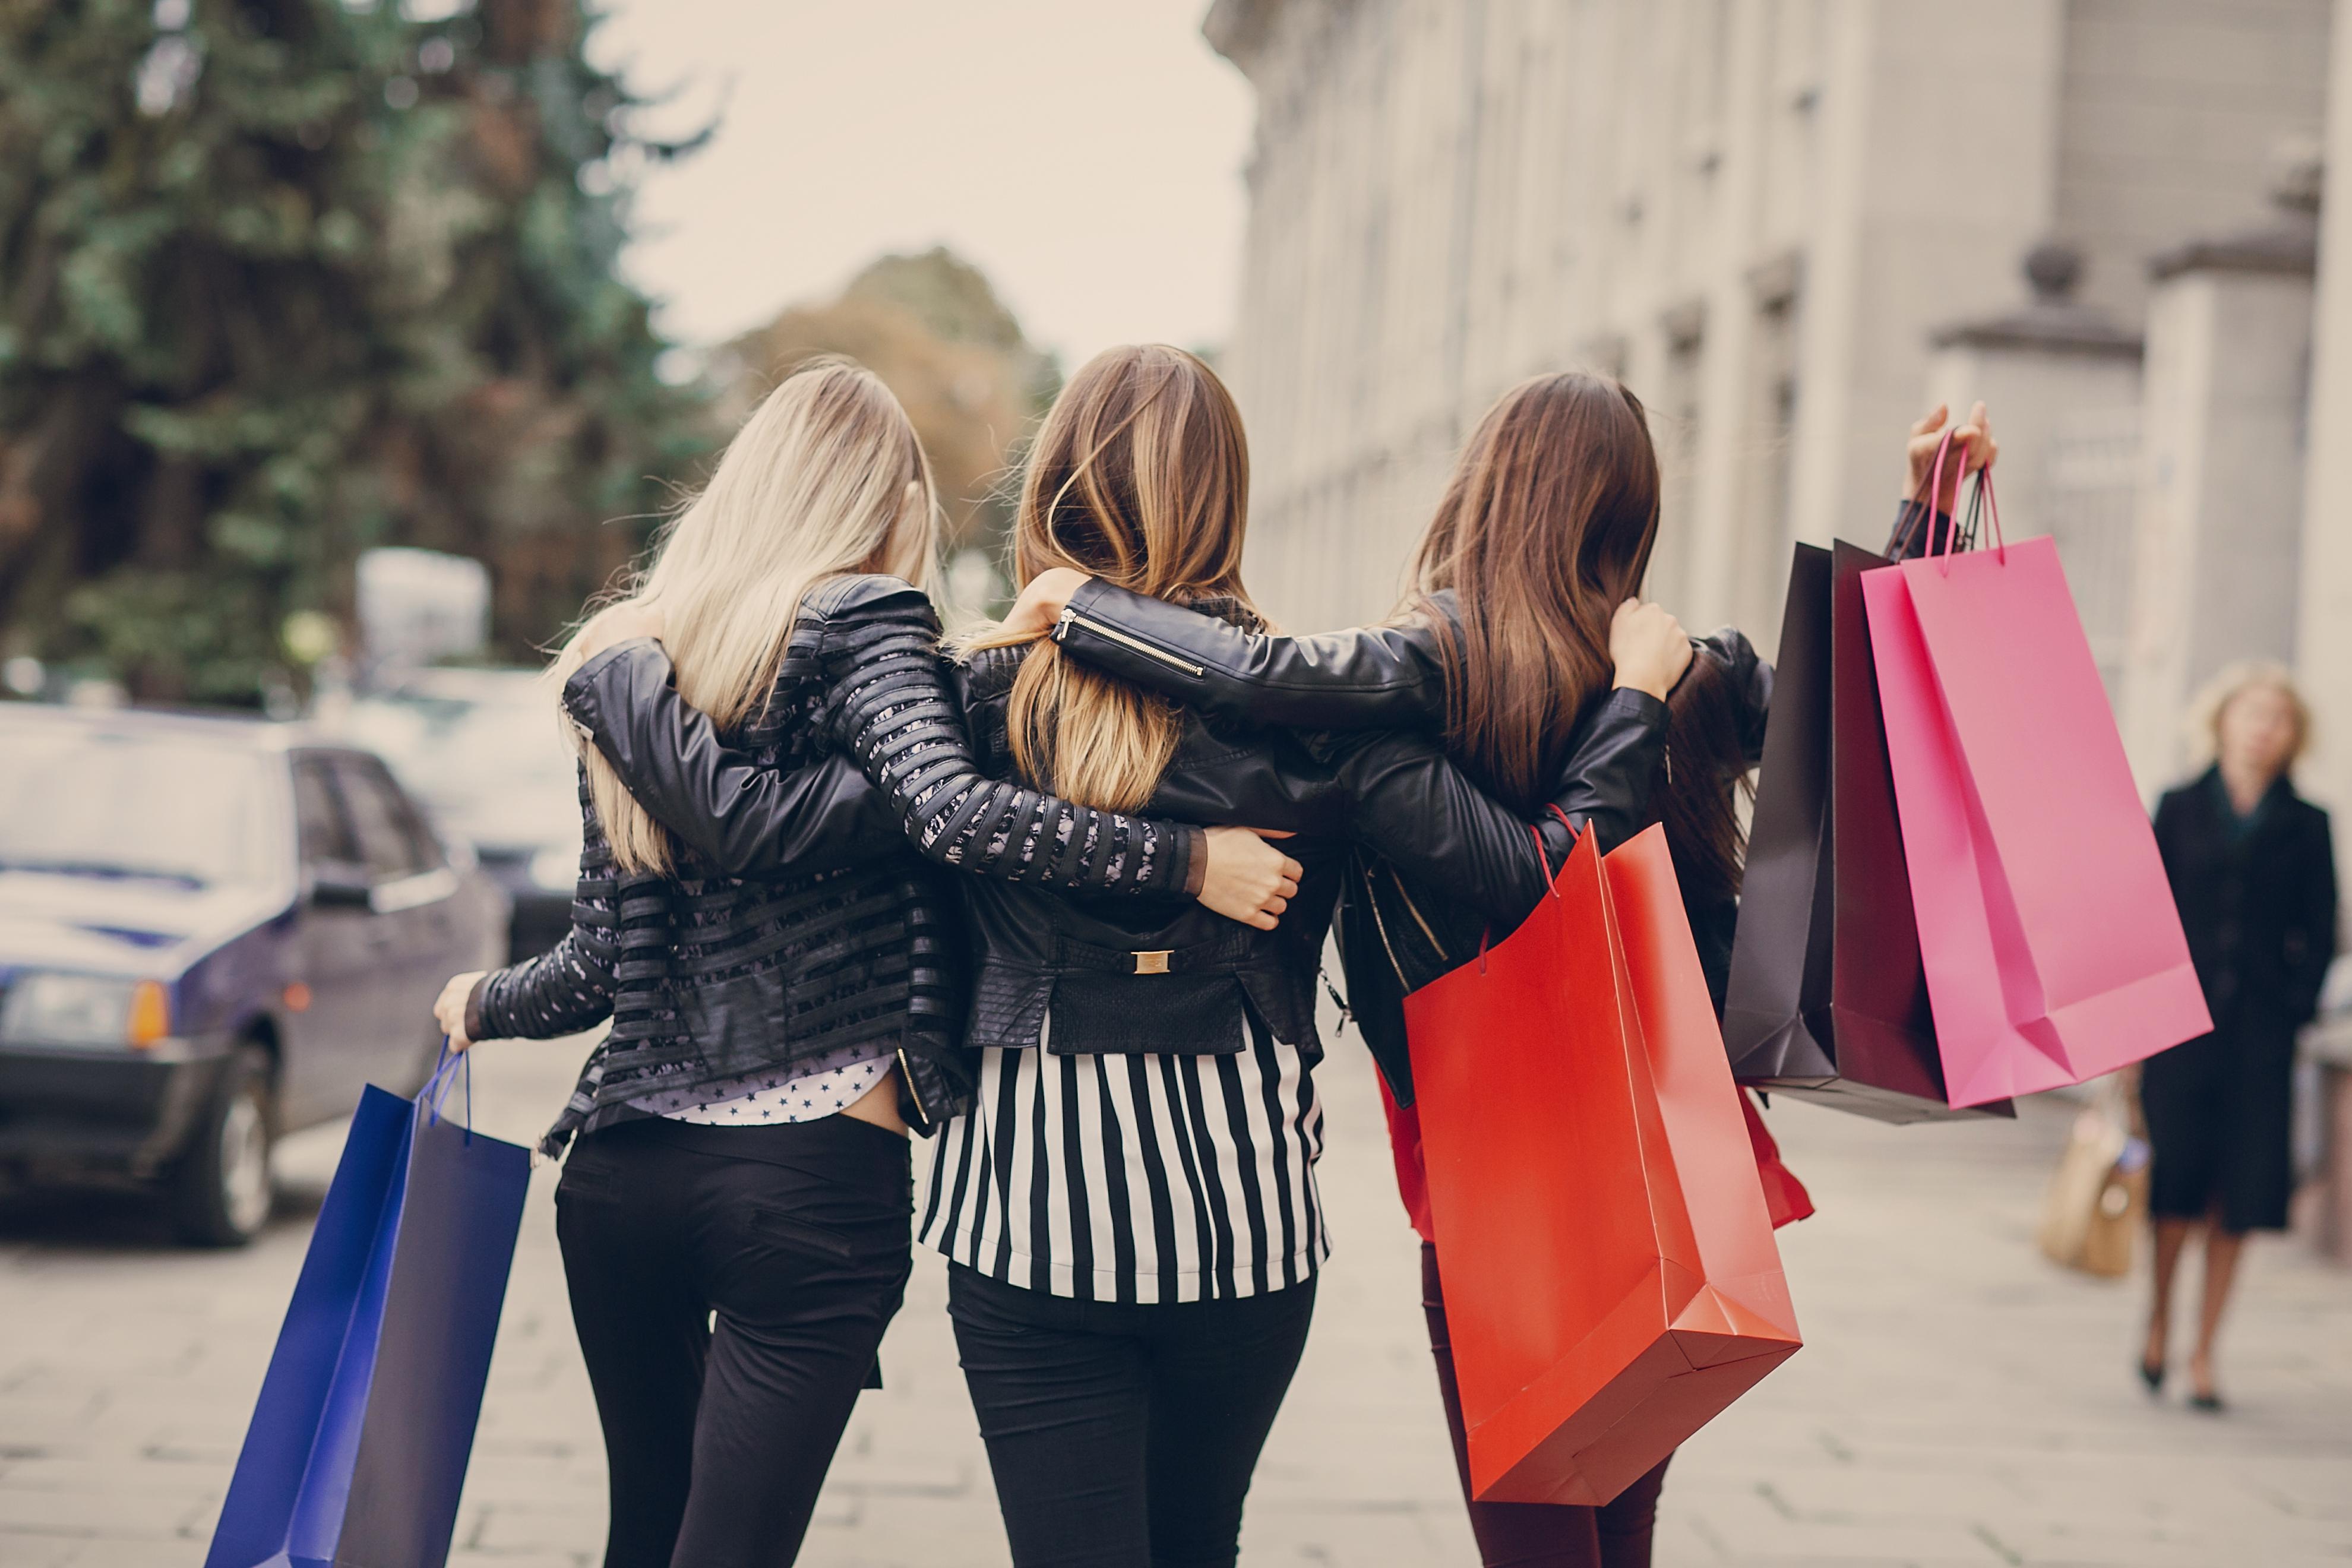 Three young women walking down a street holding shopping bags.